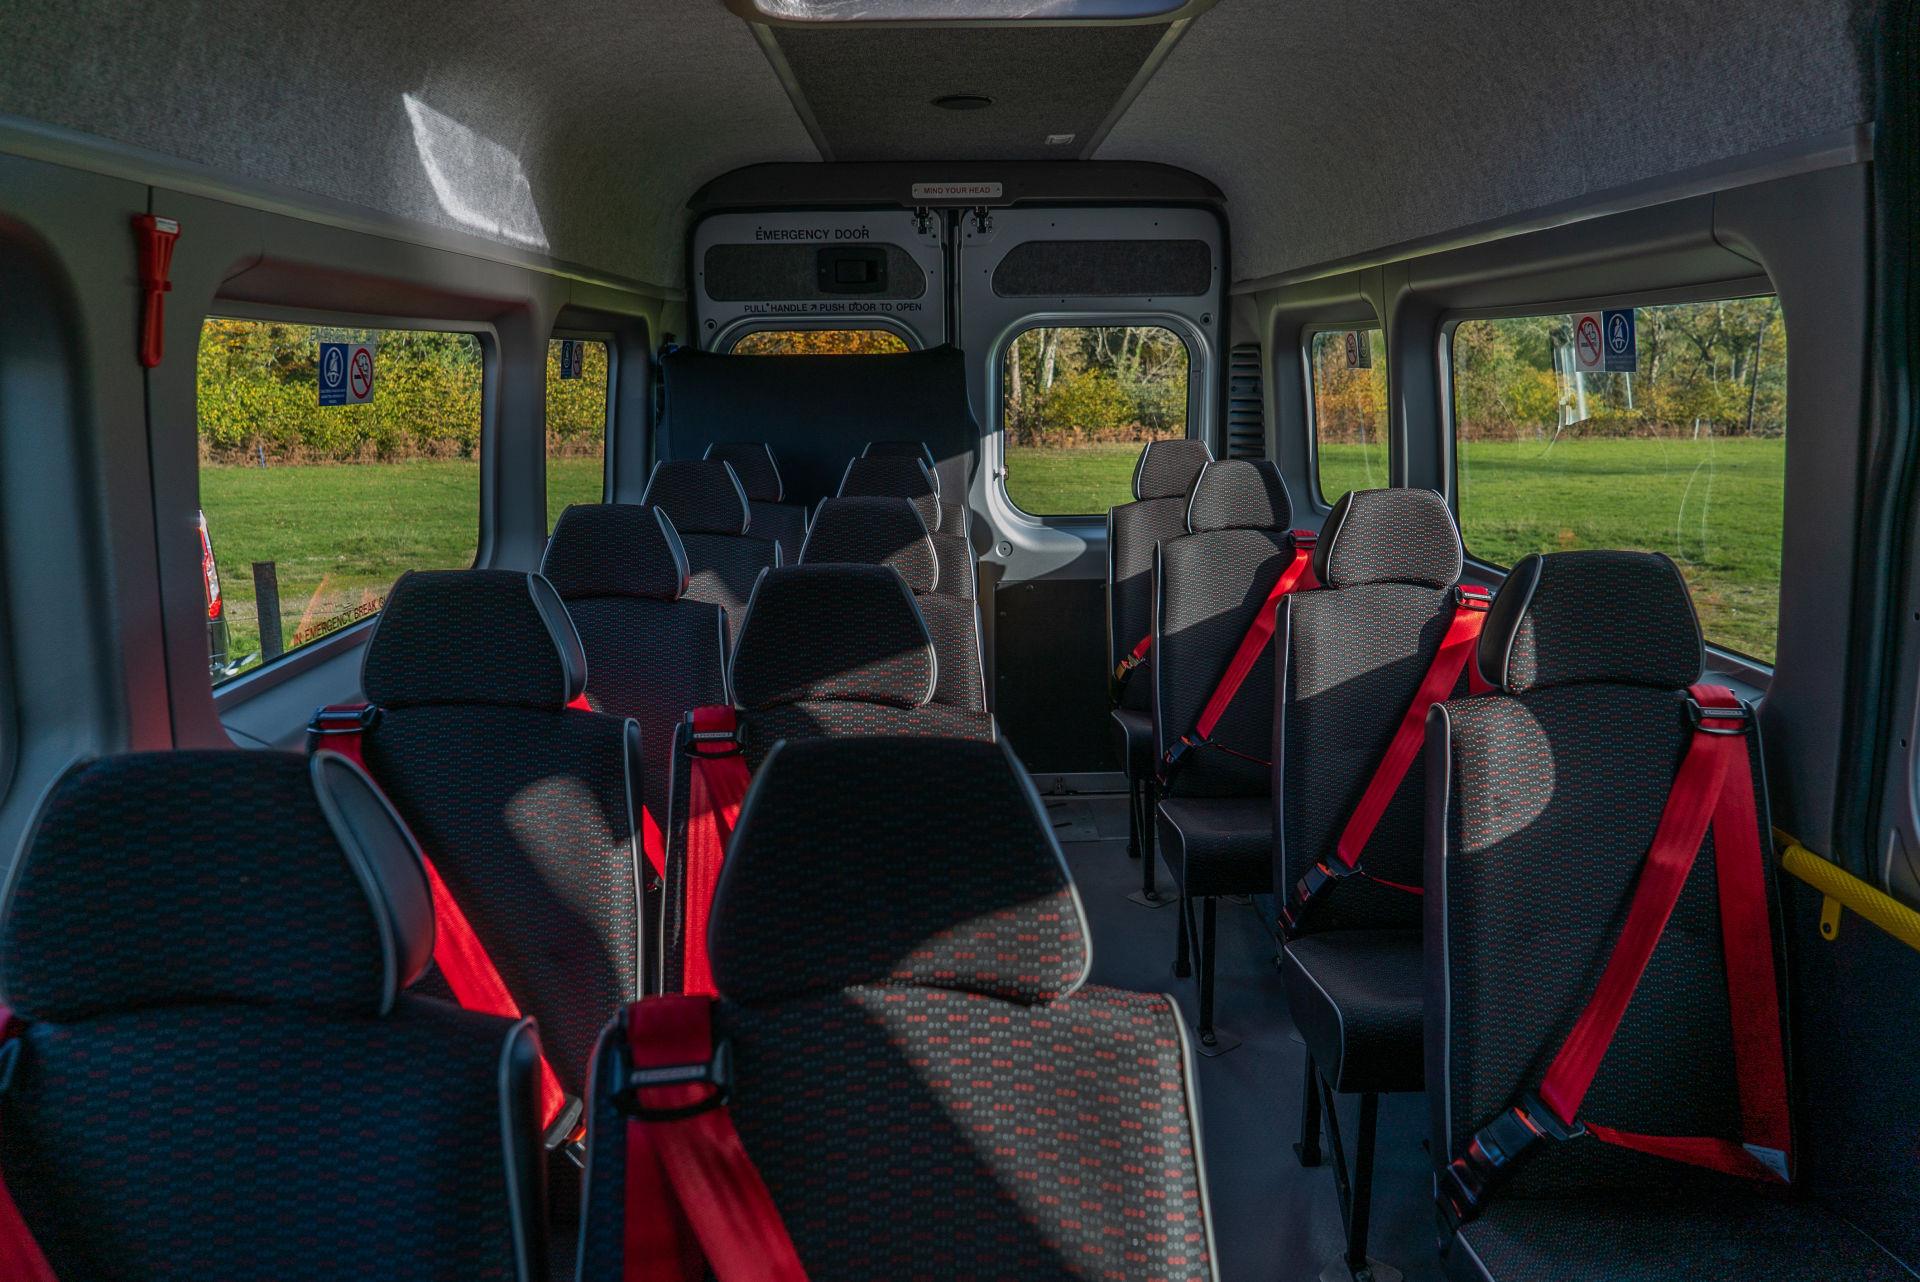 2016 Peugeot Boxer 17 Seater Accessible Minibus for Sale - Image 3